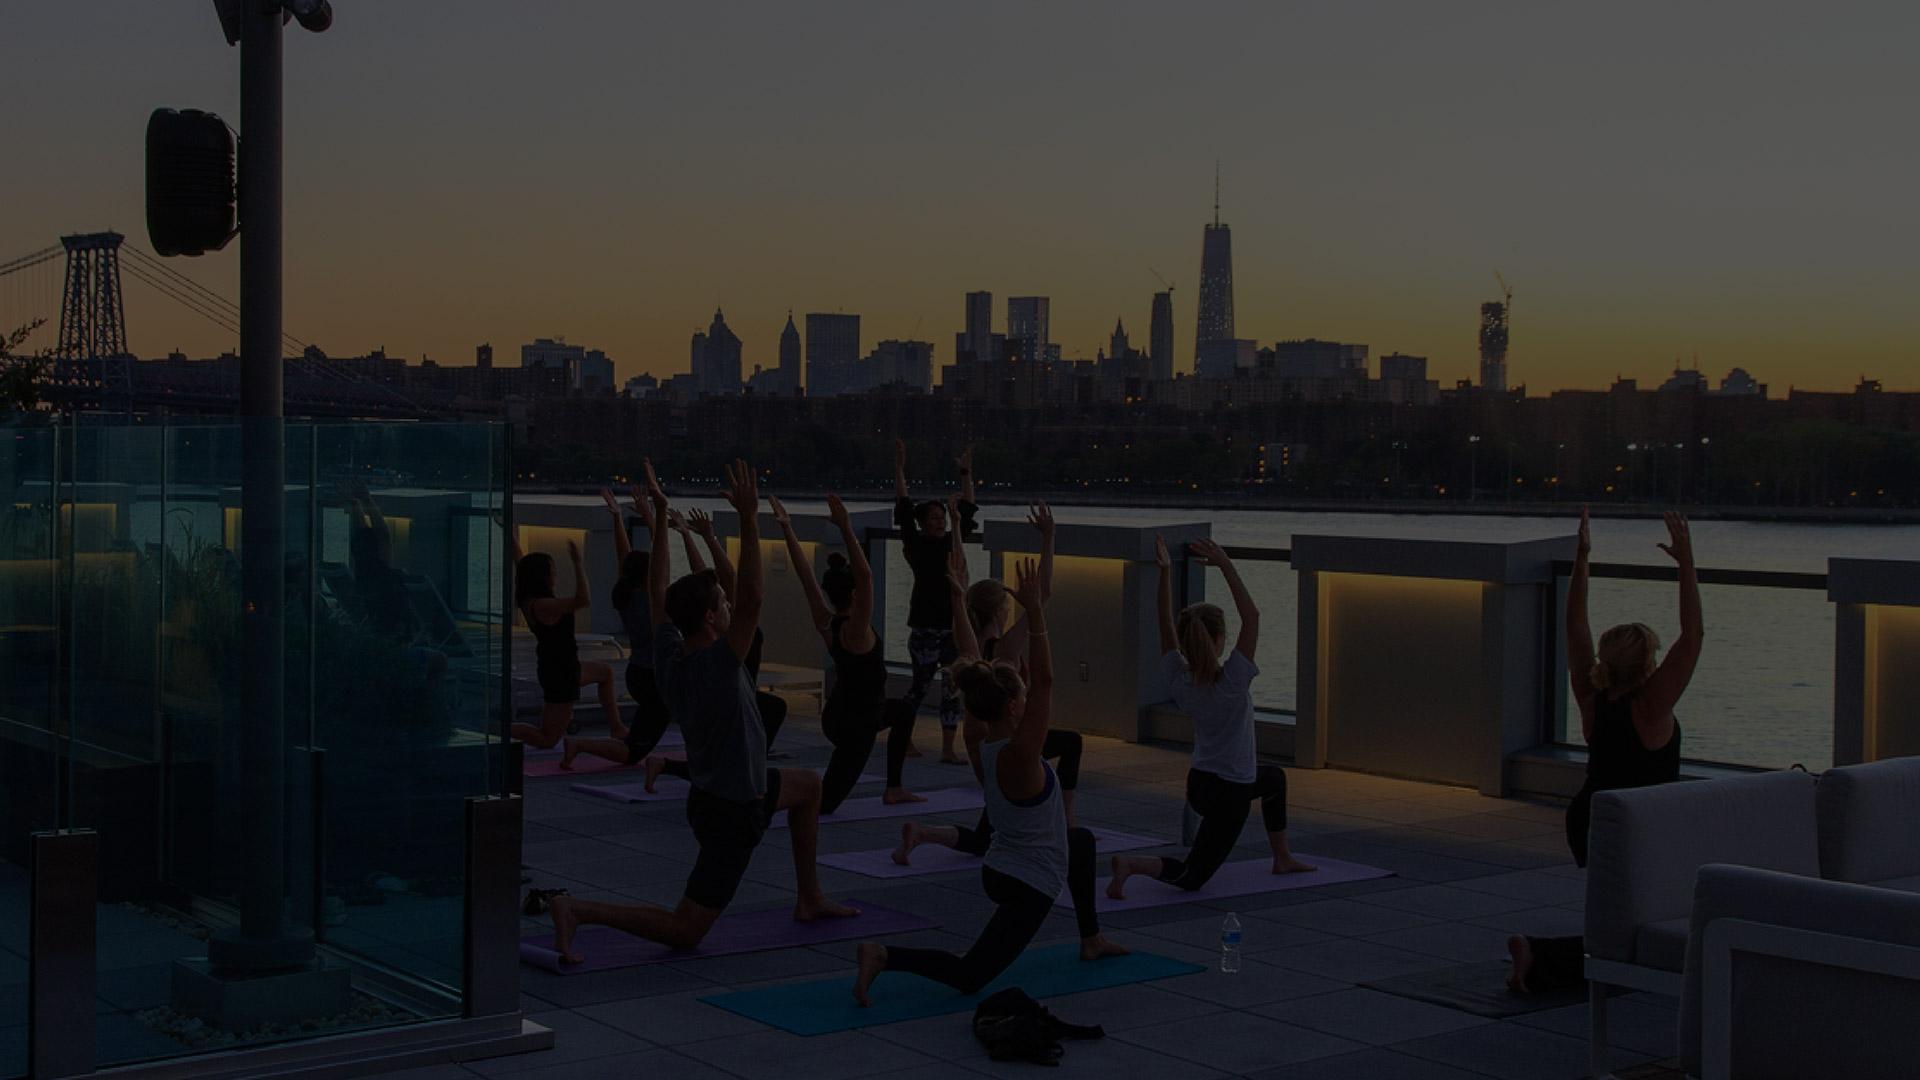 Evening yoga session - 1N4 Williamsburg New York